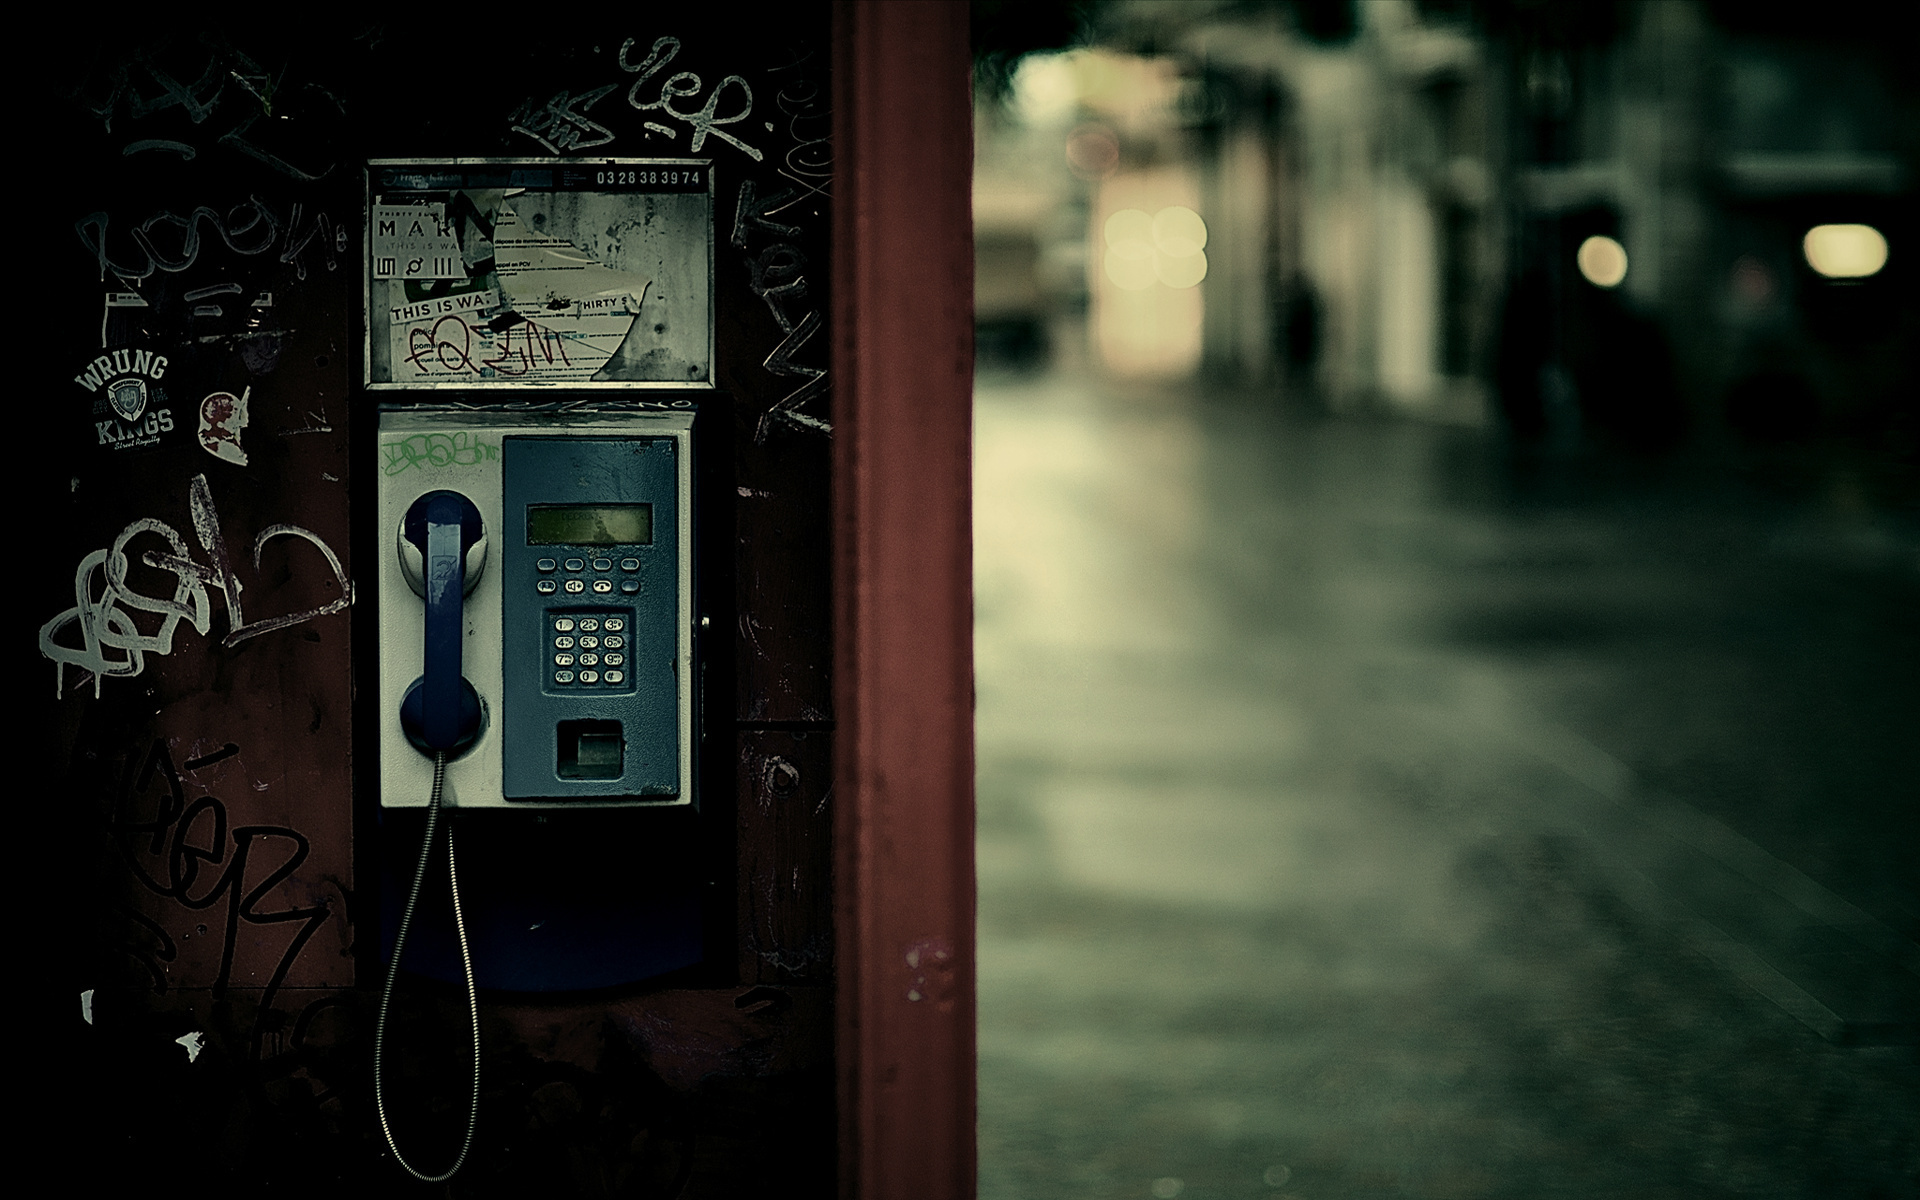 Telephone booth city lights wallpaper   ForWallpapercom 1920x1200